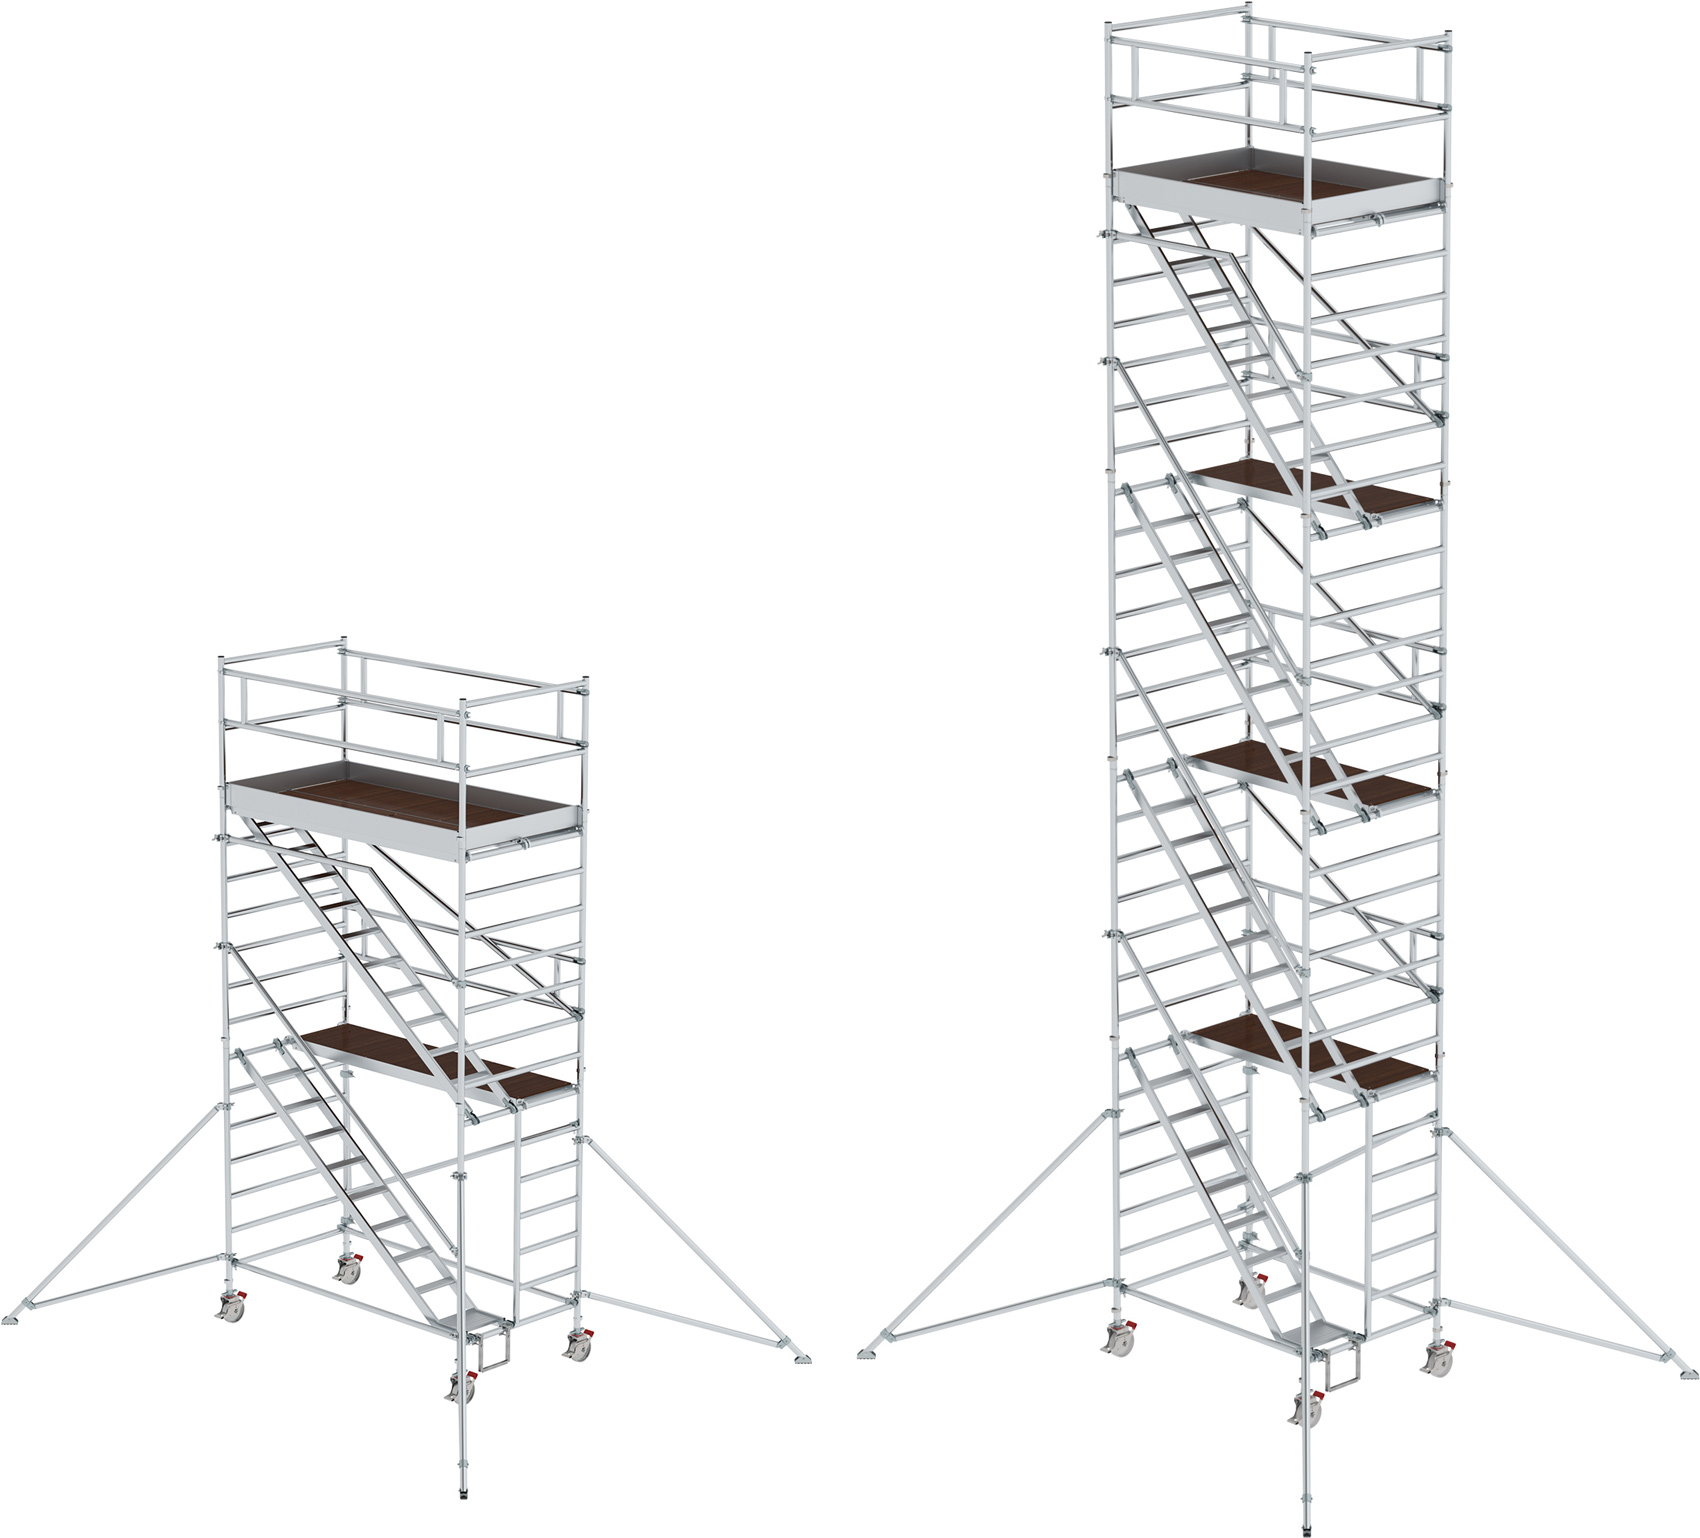 Treppengerüst Günzburger 2,45 x 1,35 m